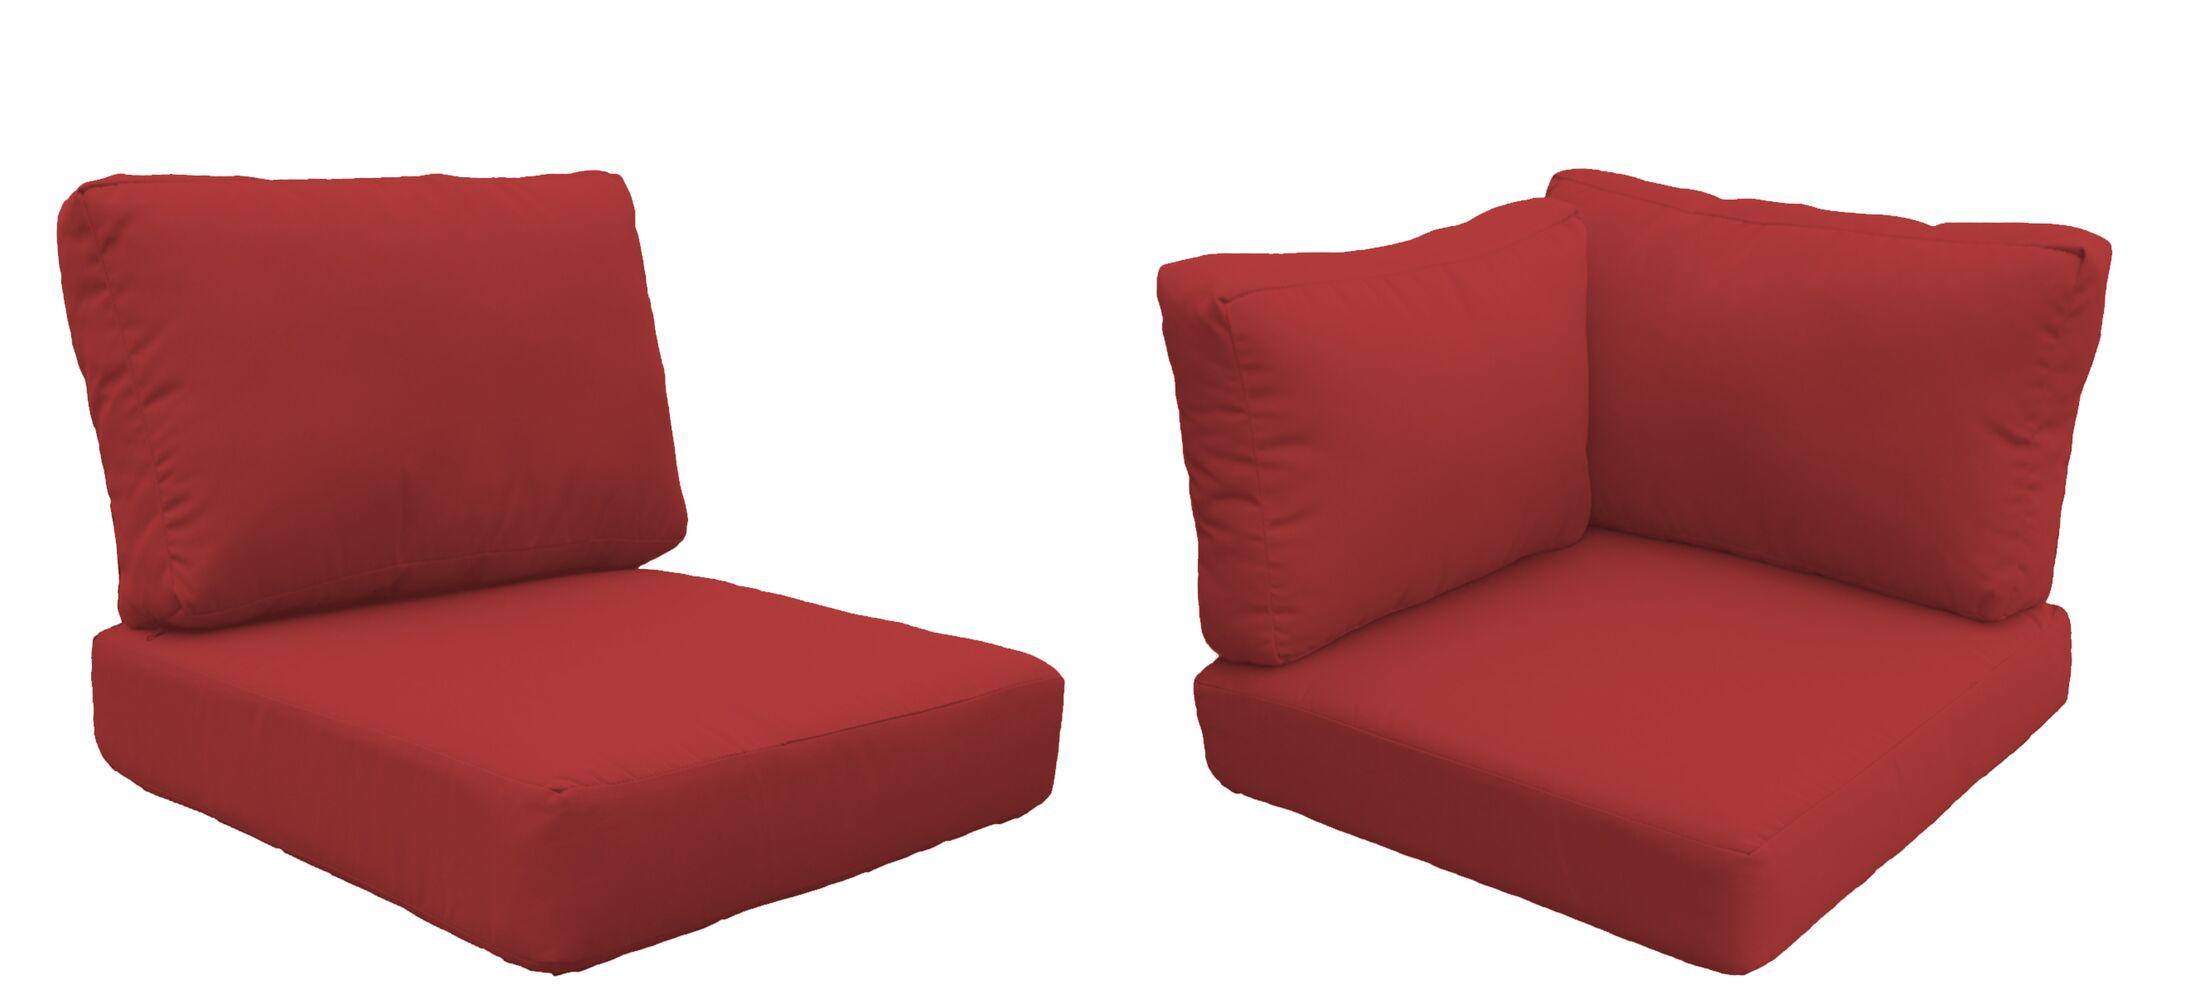 Capecod 13 Piece Outdoor Lounge Chair Cushion Set Fabric: Terracotta